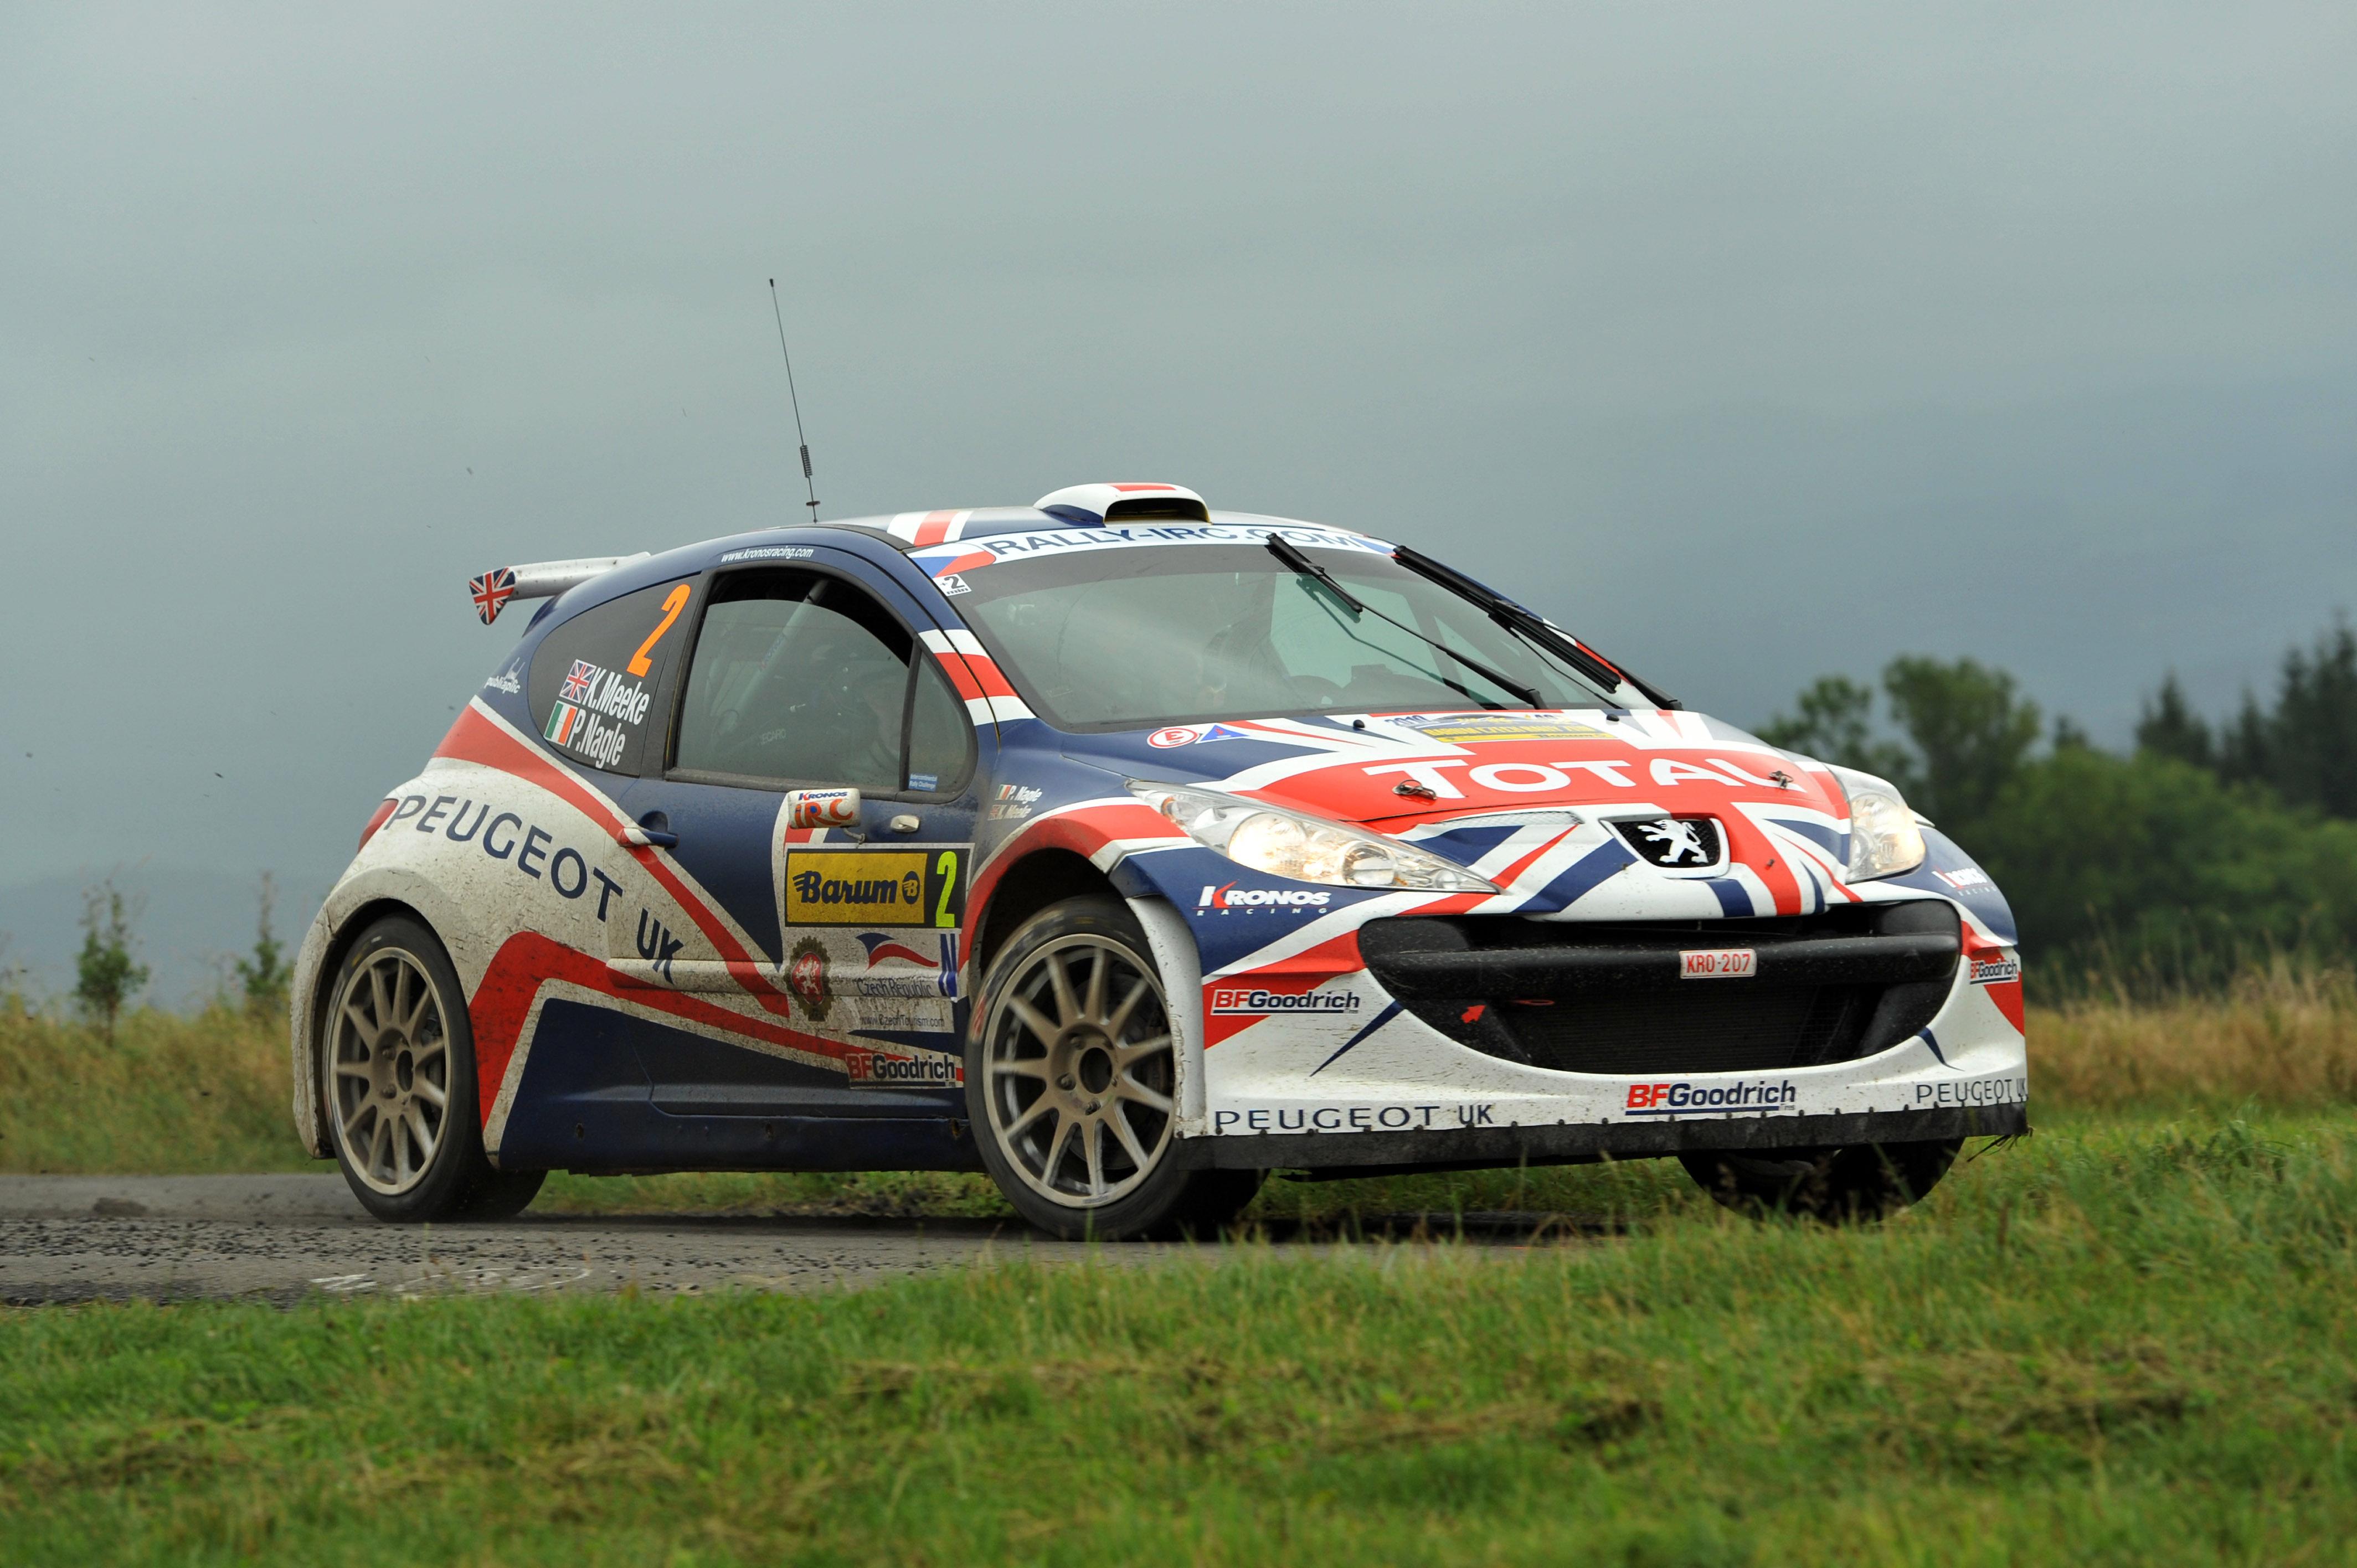 S0-La-Peugeot-207-S2000-Evolution-va-ent